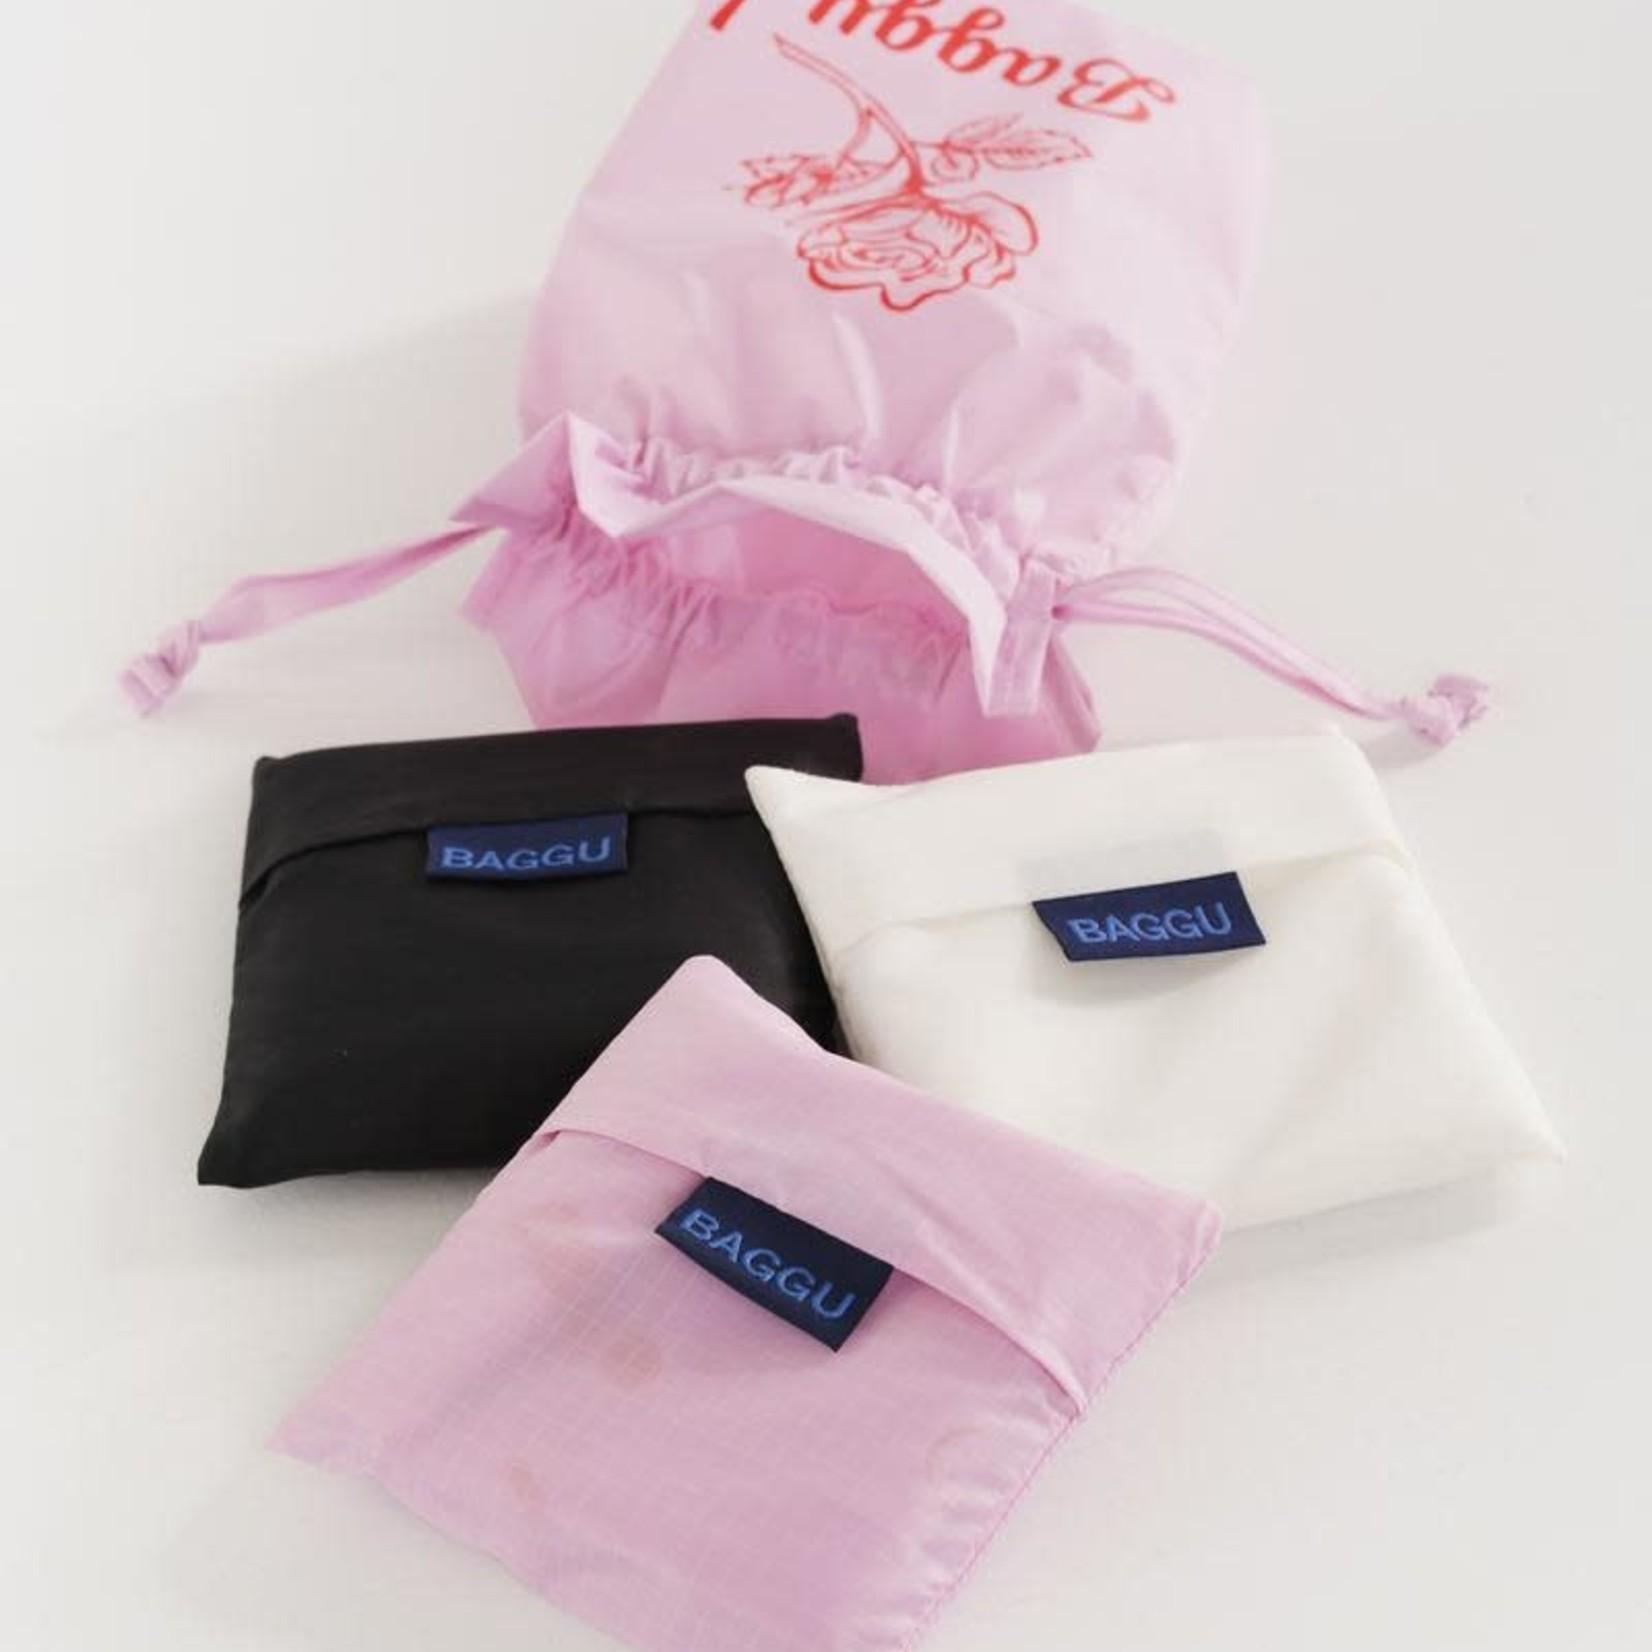 Baggu Baggu Reusable Bag Standard Thank You Set of Three